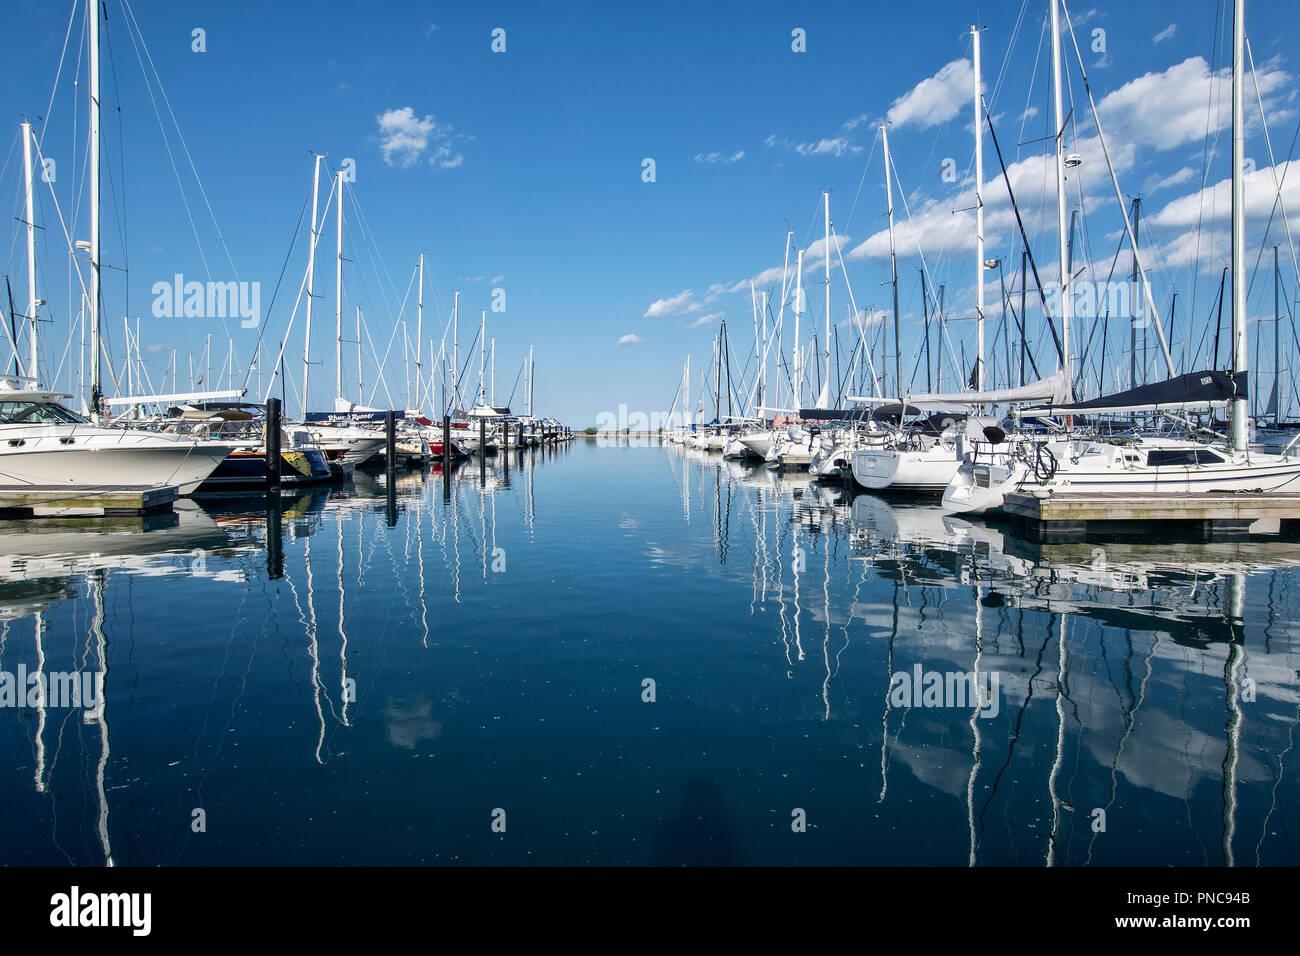 Boats in DuSable Harbor, Lake Michigan, Chicago, IL. - Stock Image